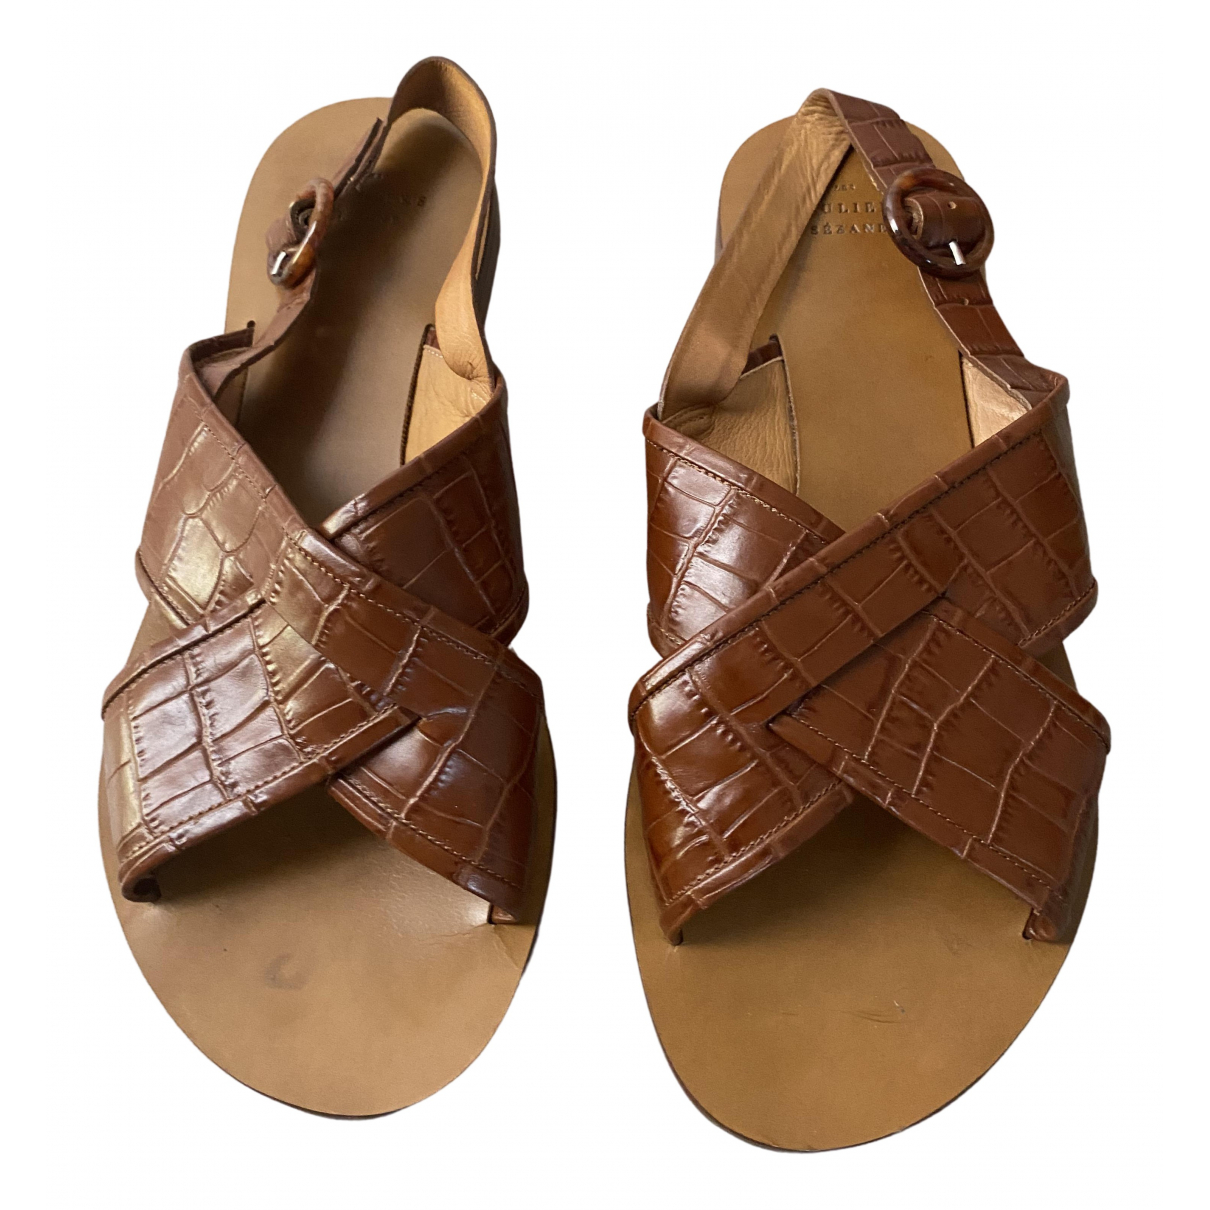 Sezane - Sandales Spring Summer 2020 pour femme en cuir - camel